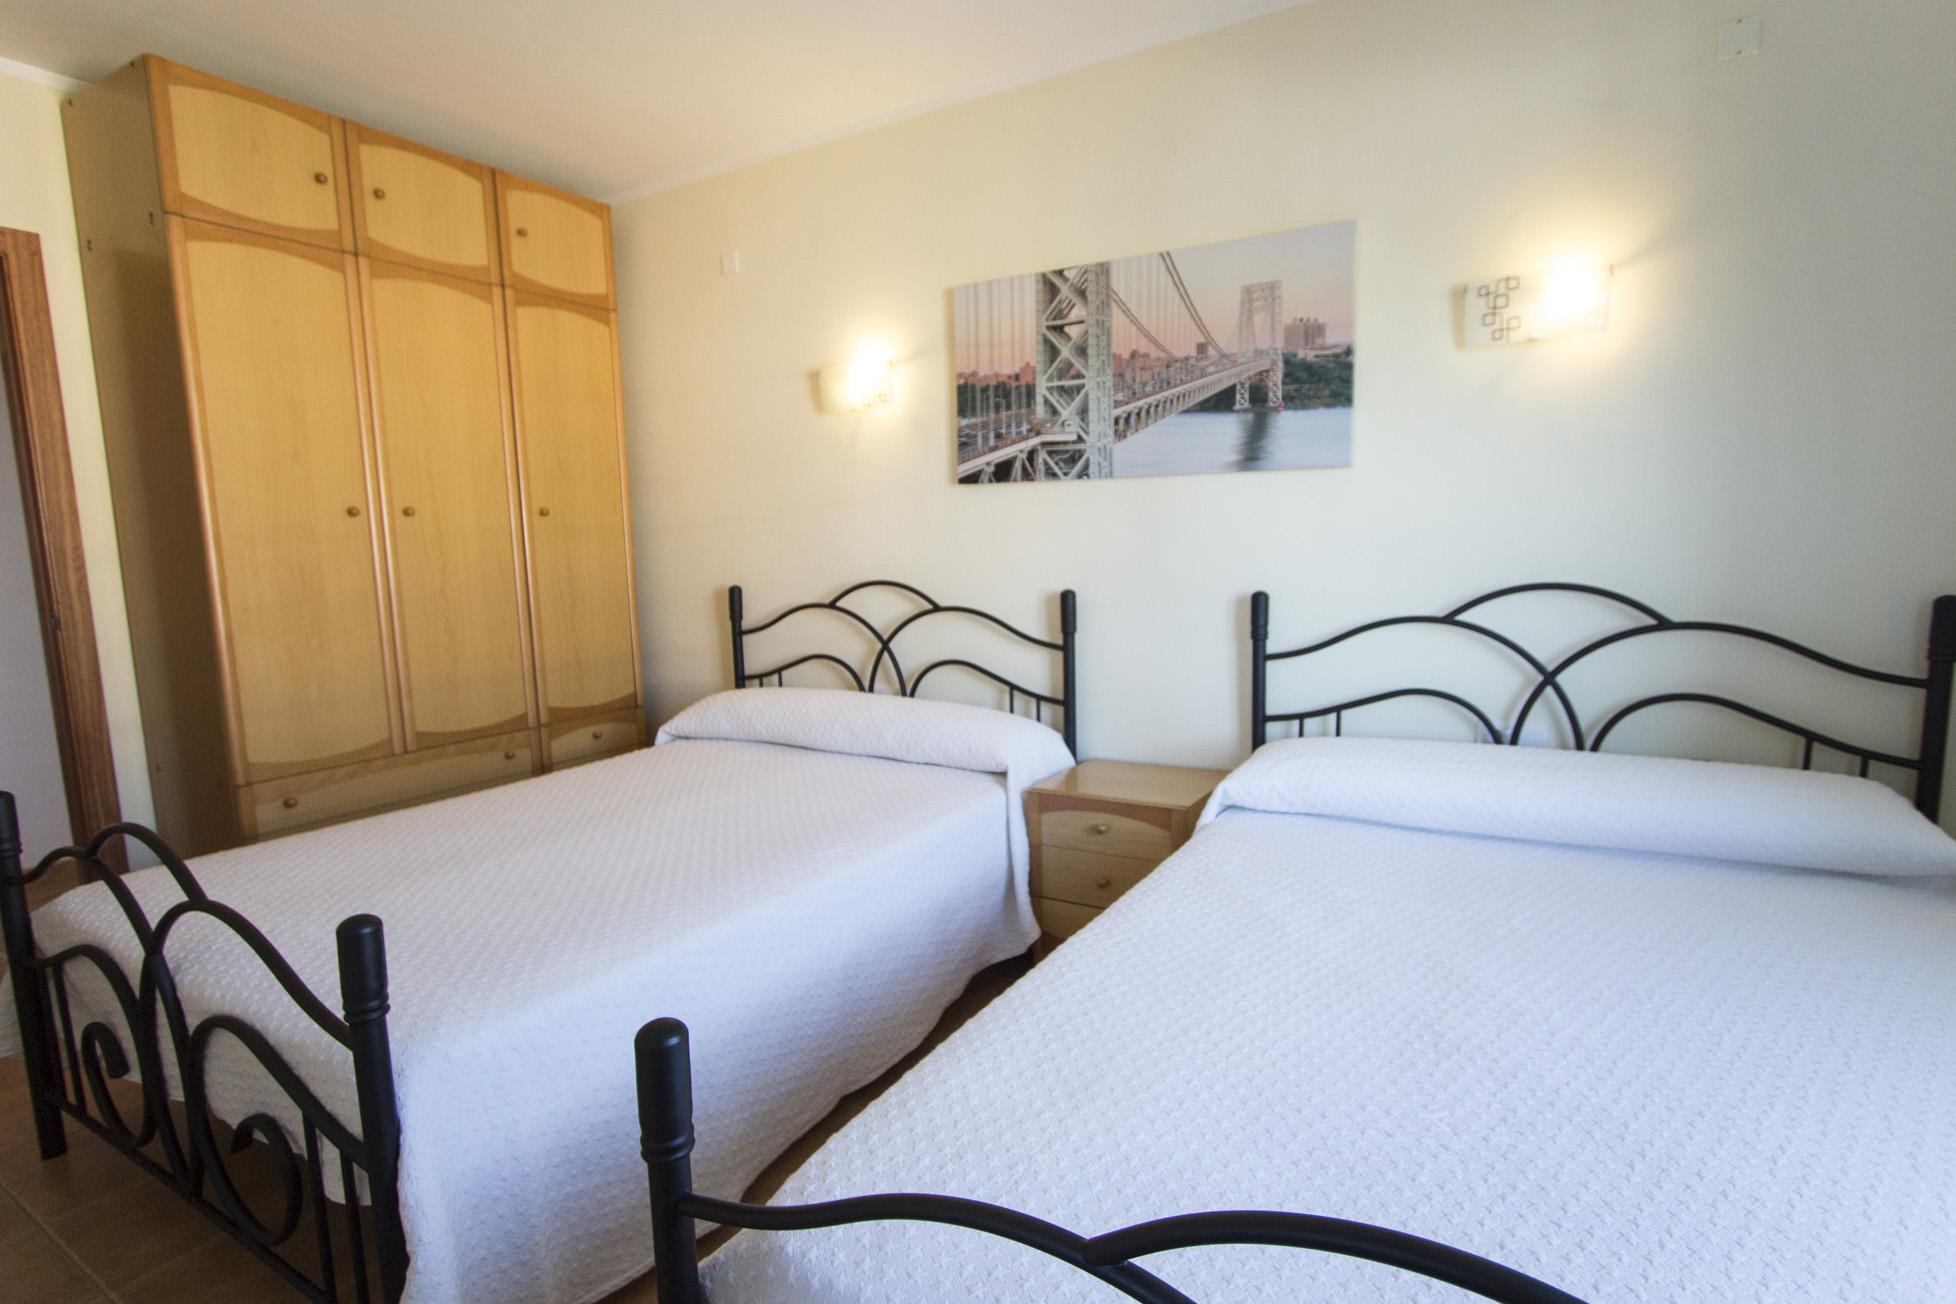 Ferienhaus Catalunya Casas: Incredible Villa in Sils, a short drive to Costa Brava beaches! (1890893), Les Mallorquines, Girona, Katalonien, Spanien, Bild 15